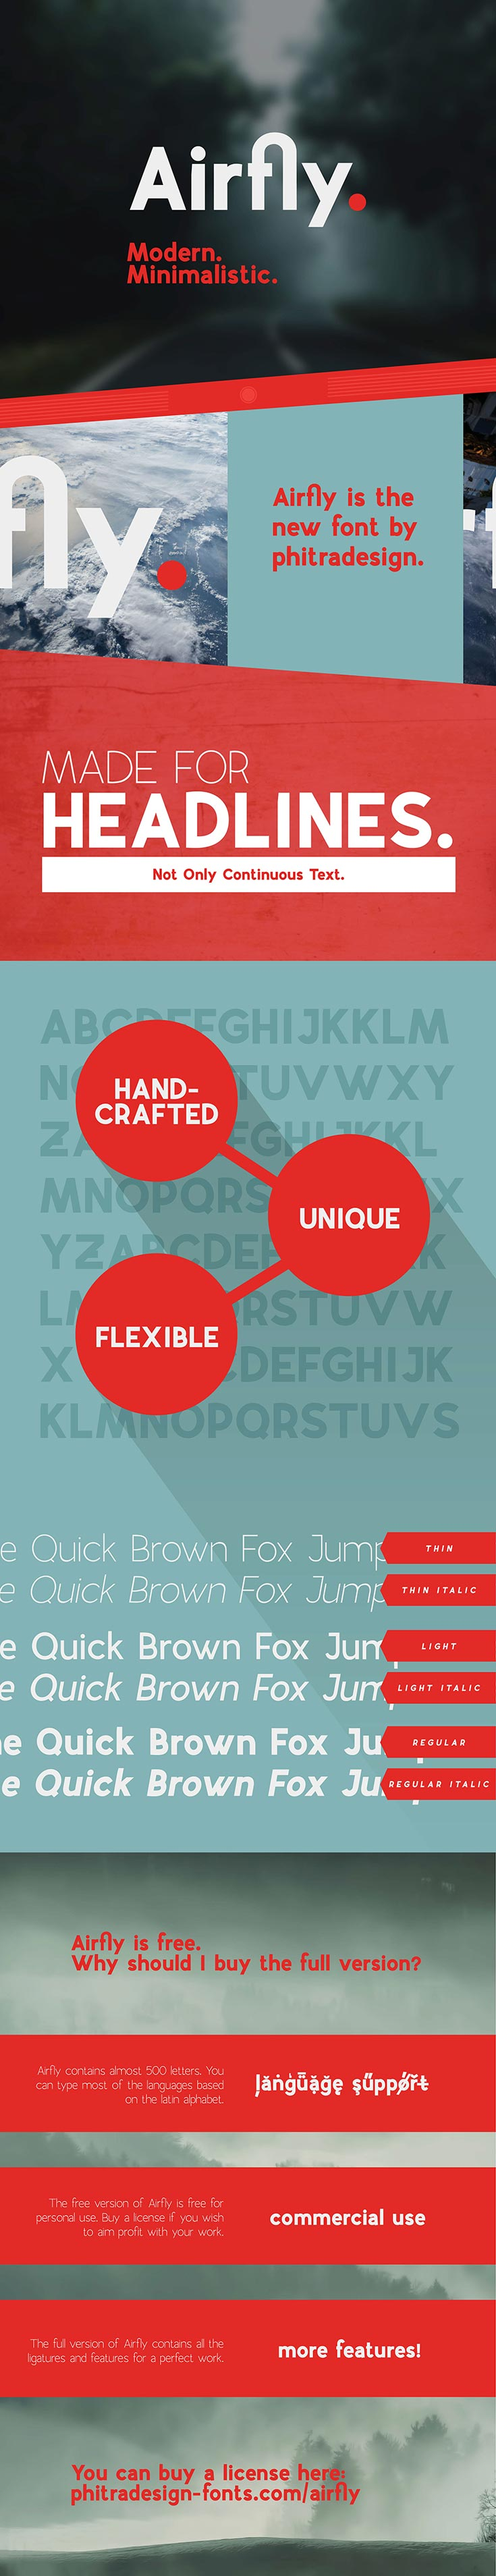 Sans Serif Font Free Download For Mac - softboss-mysoft